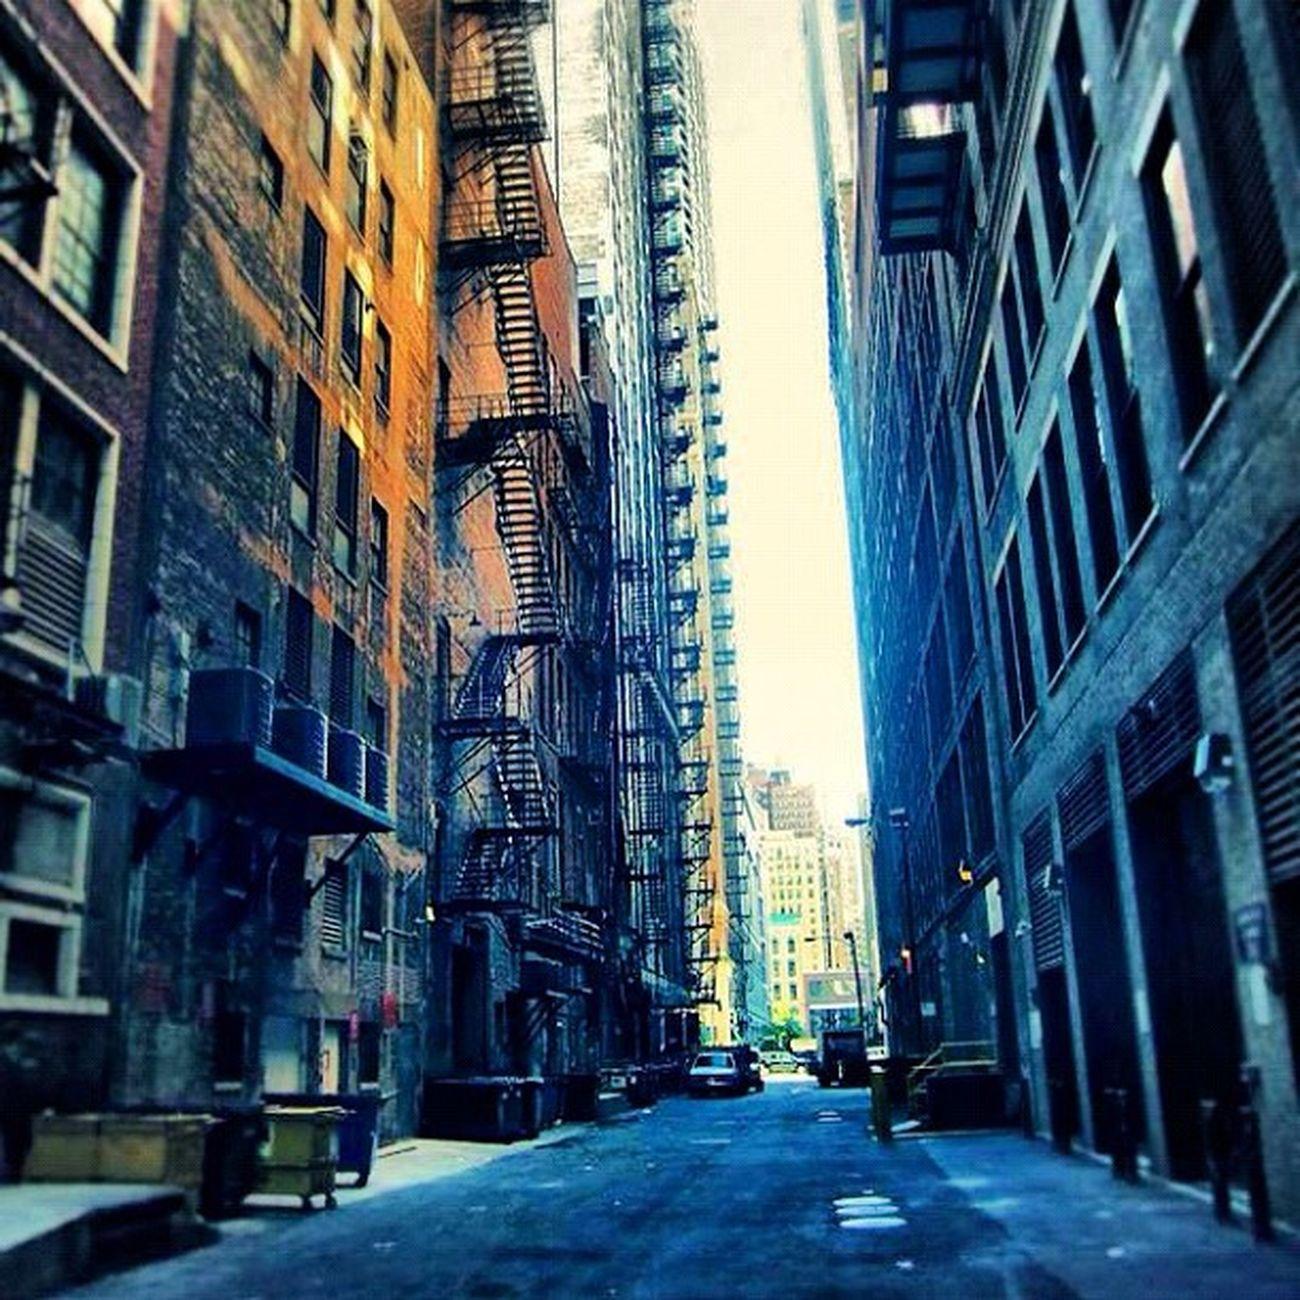 Chicago #travel #honkTravel #chicago Chicago Travel Honktravel